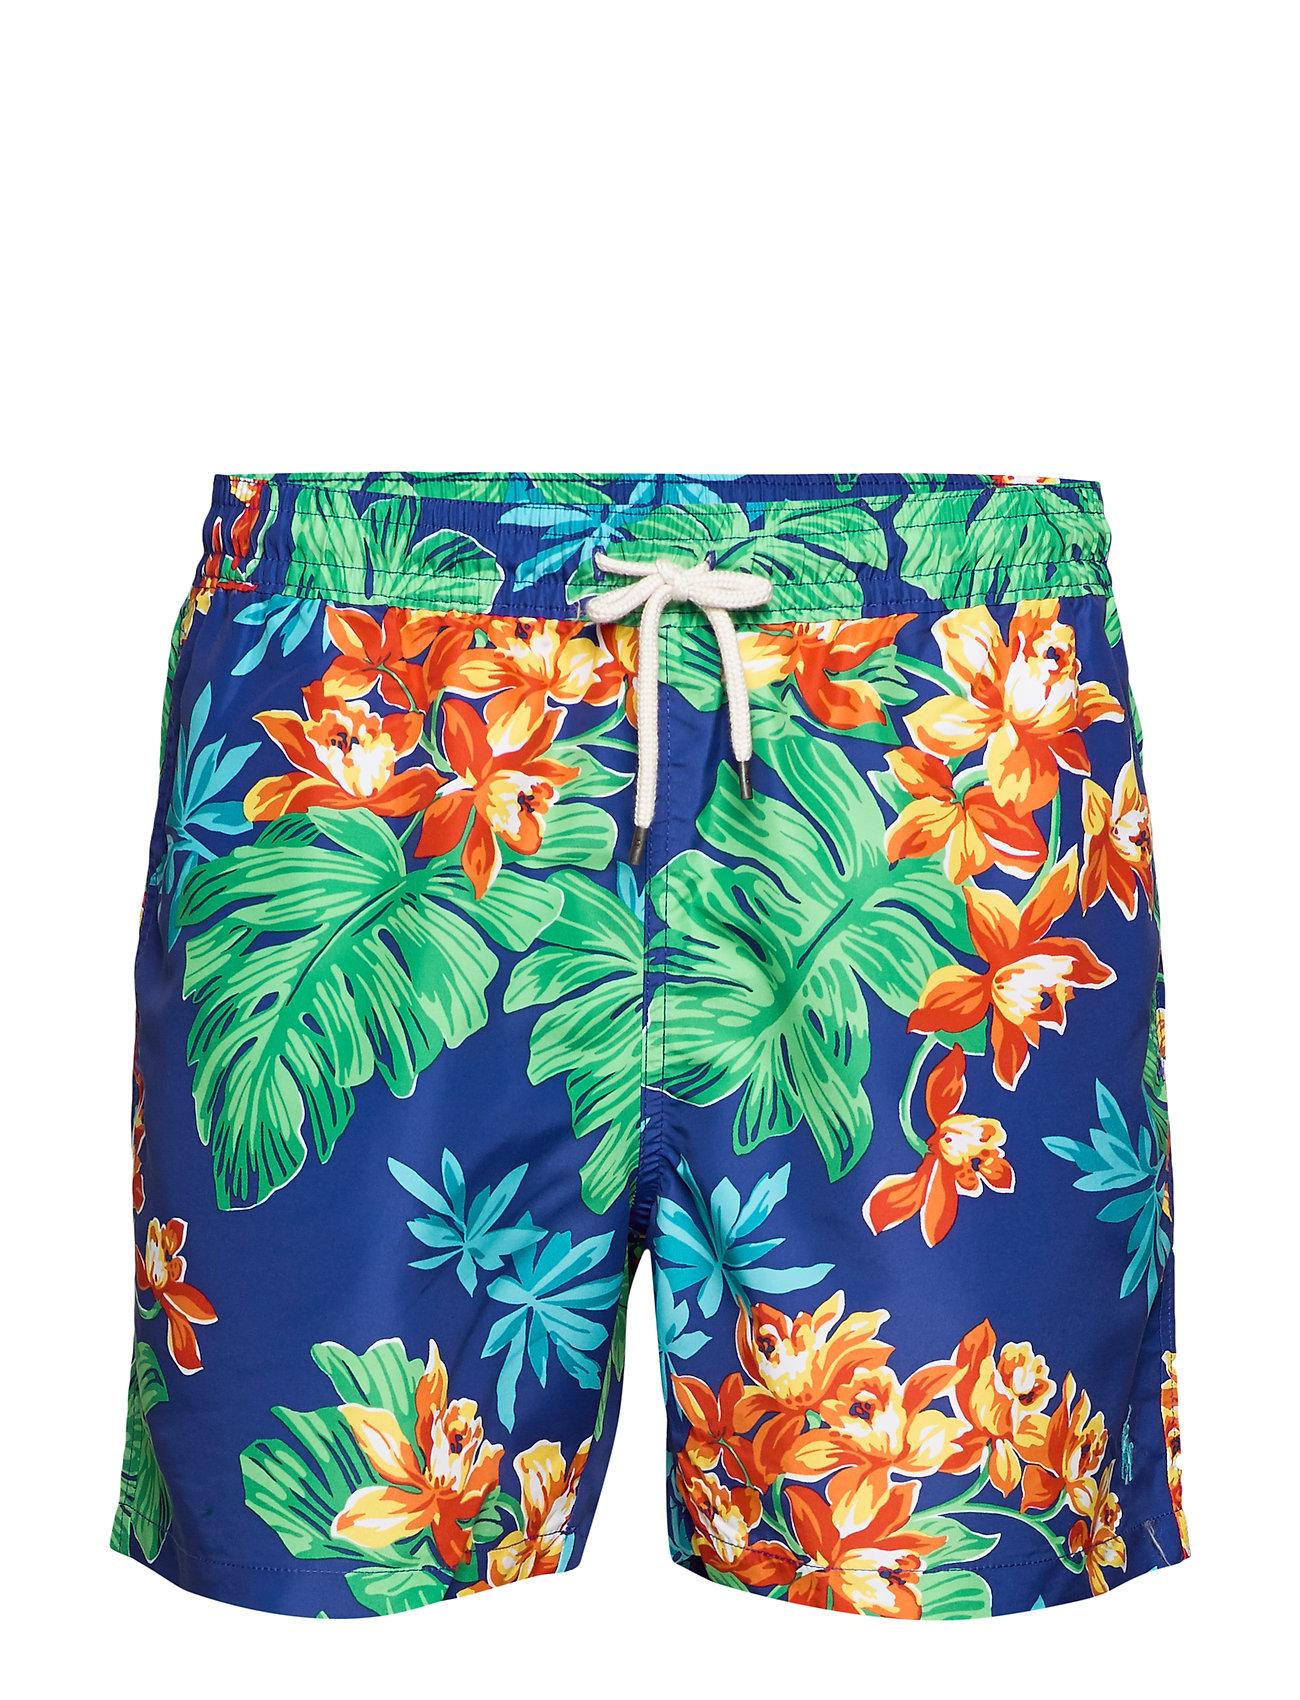 Polo Ralph Lauren 5½-Inch Traveler Swim Trunk - TROPICAL 2020